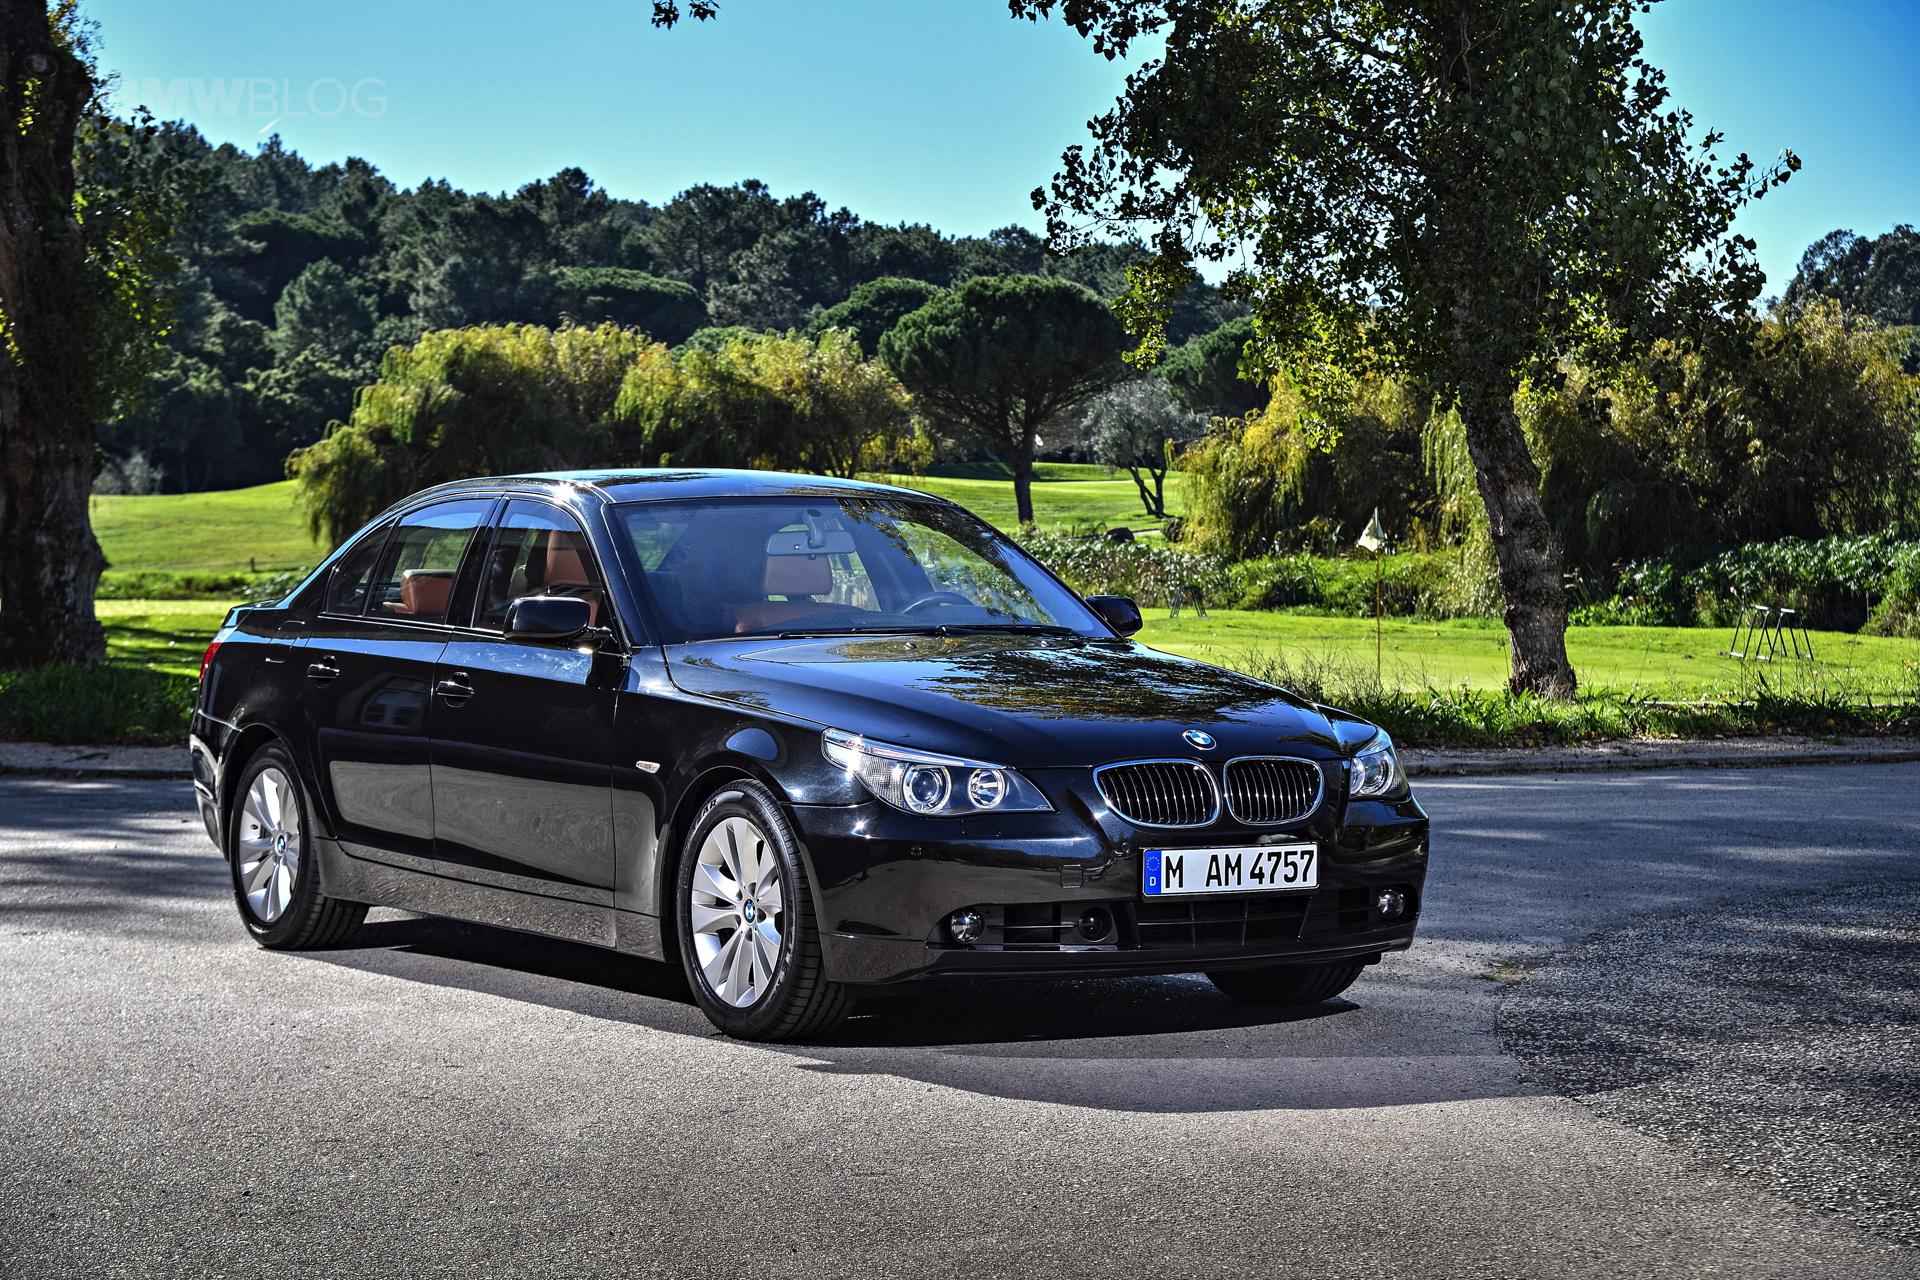 BMW E60 5 Series images 01